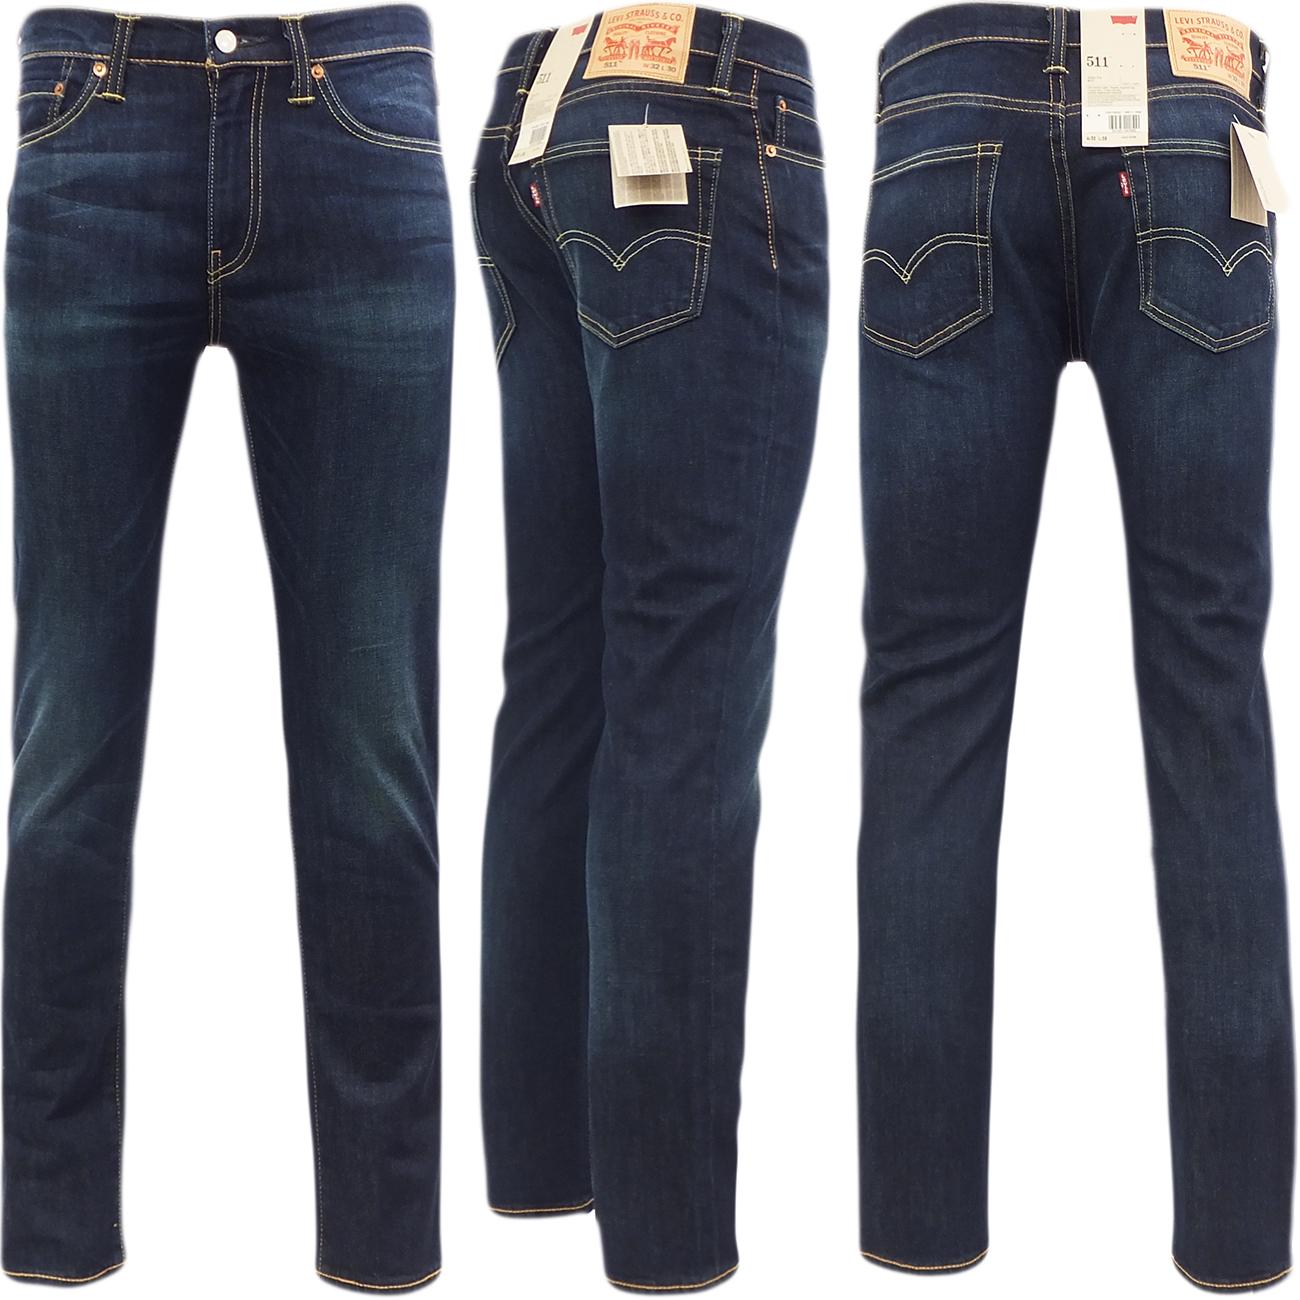 Levi's men's 511 skinny denim blue jeans